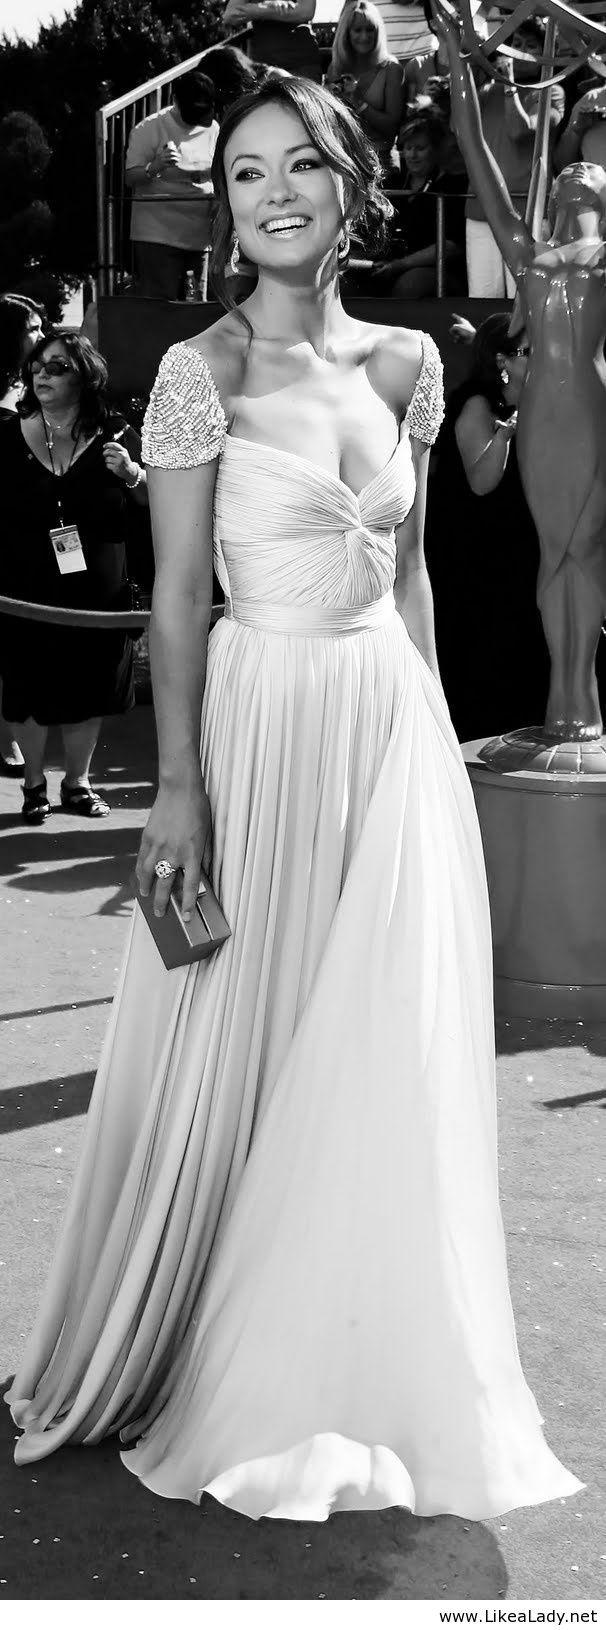 best stayclassy images on pinterest classy dress formal